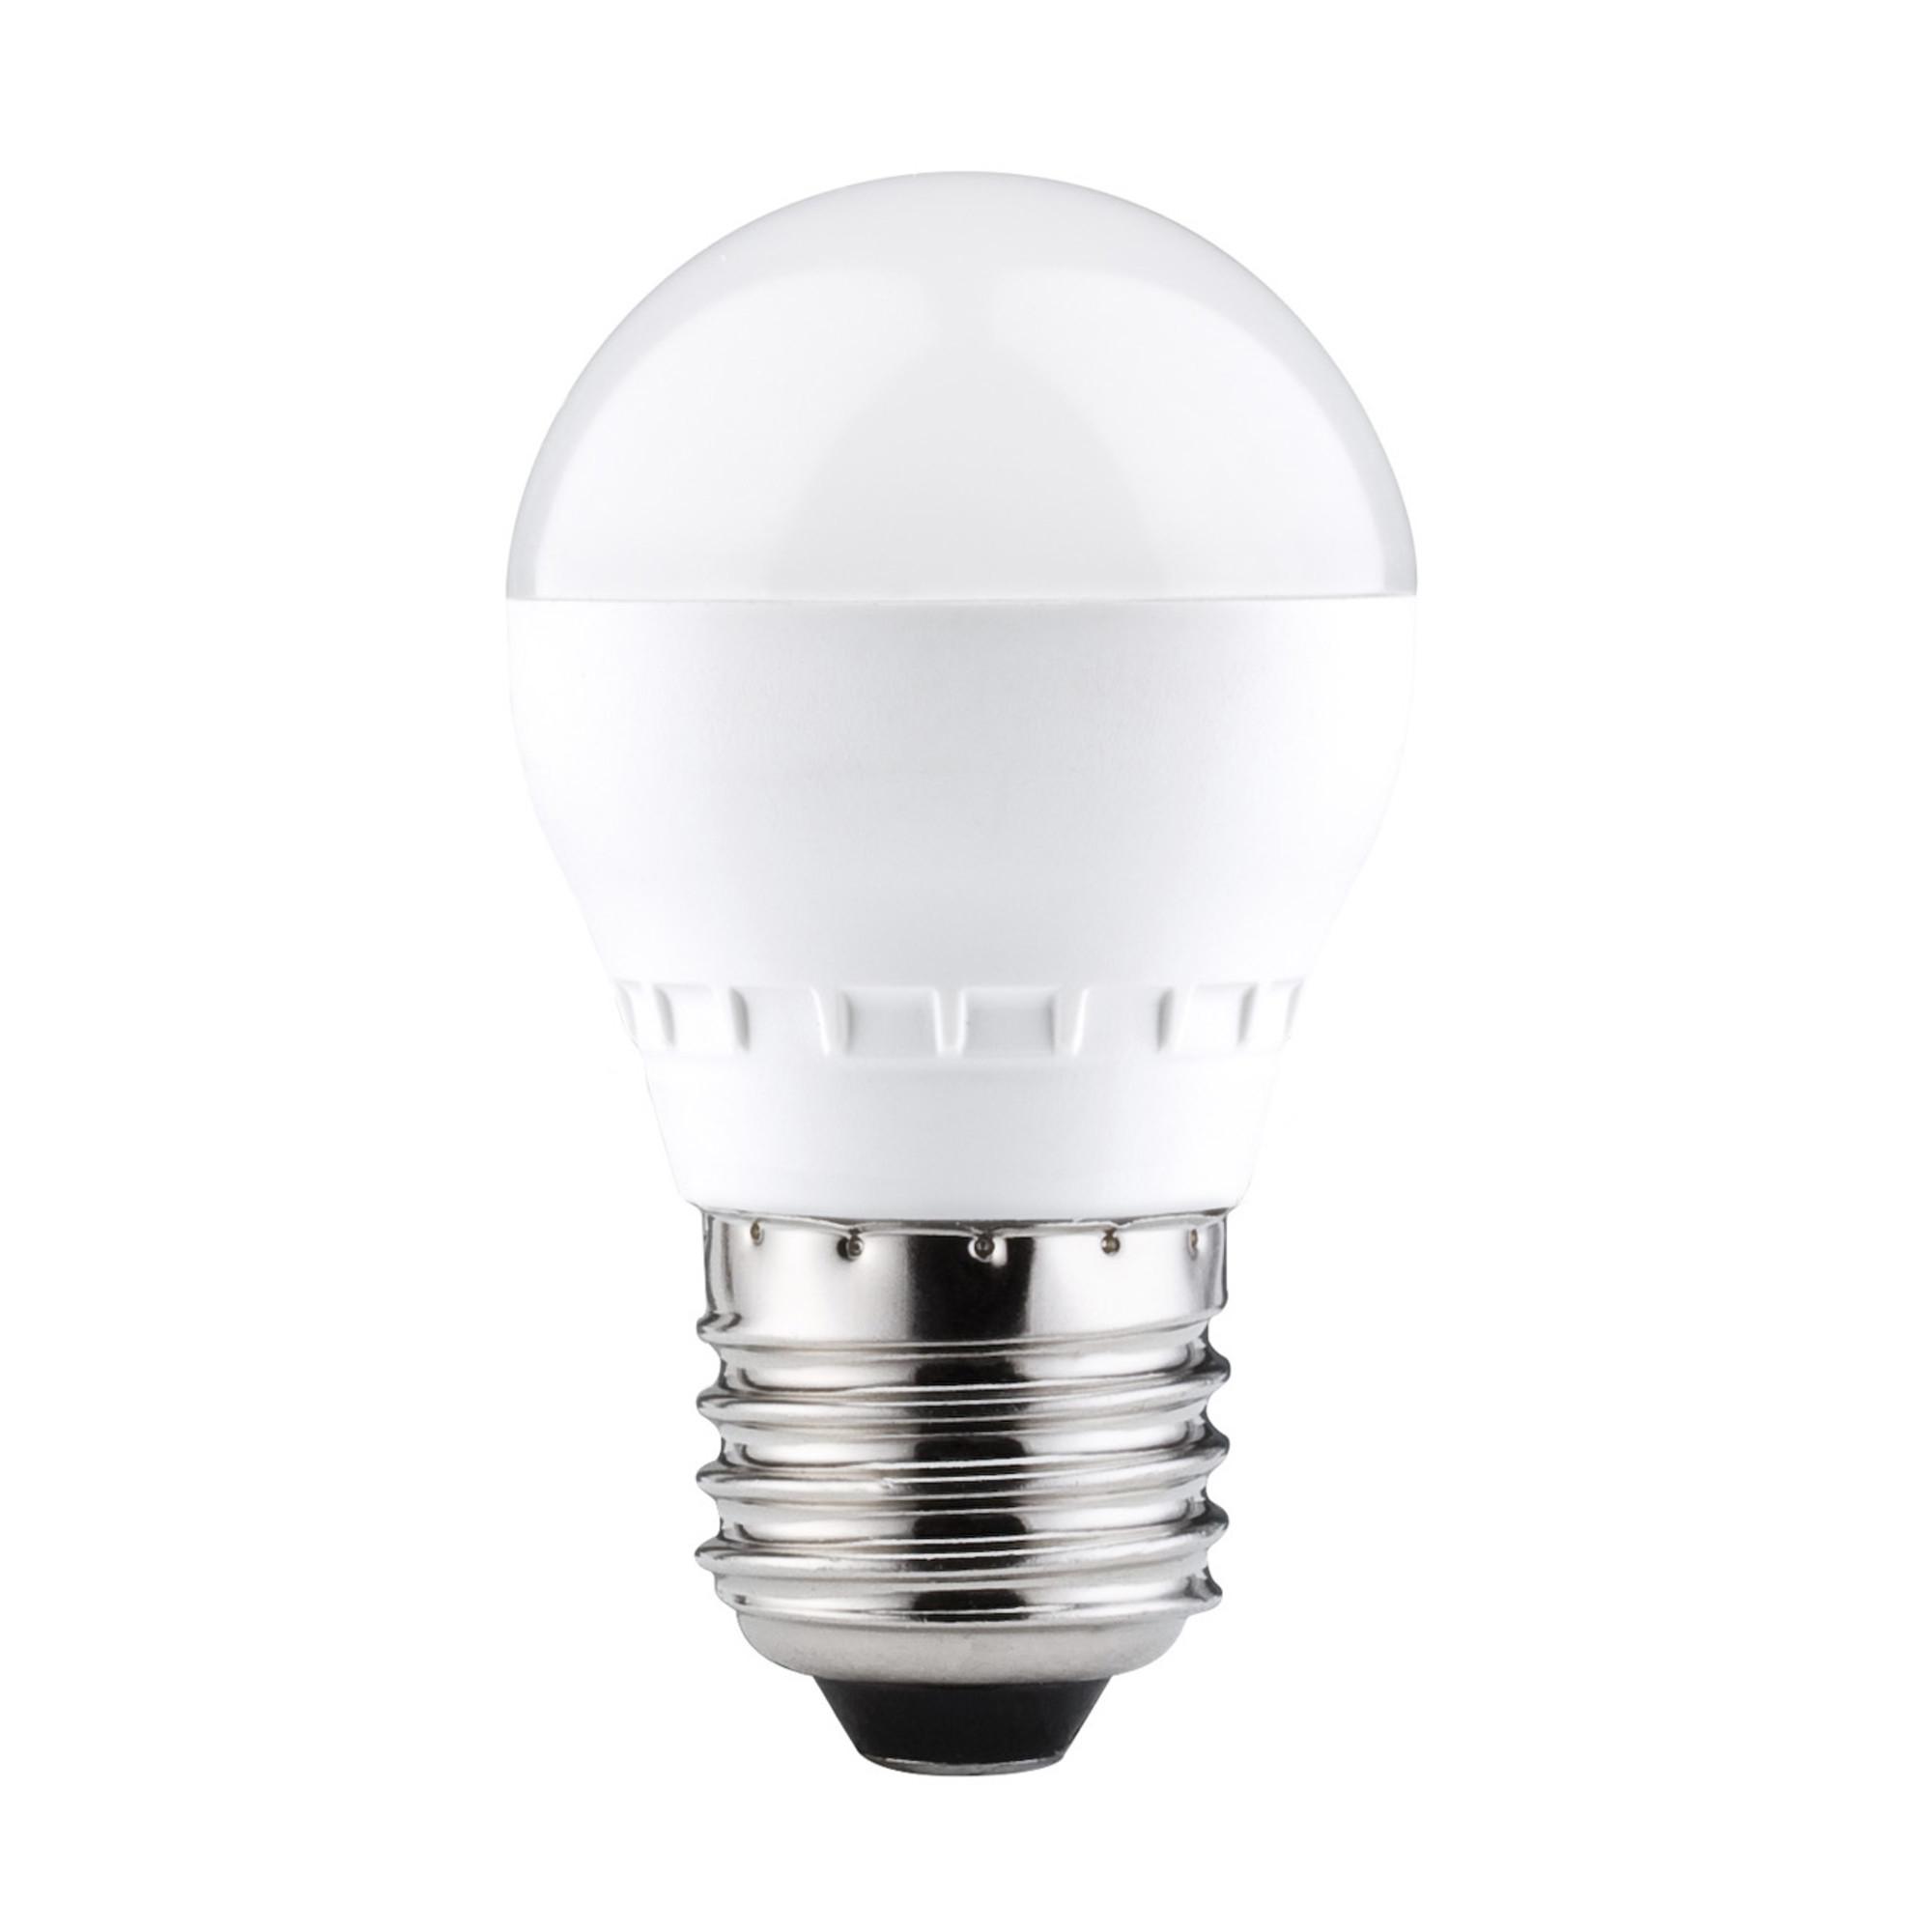 Лампа светодиодная Paulmann 28243 E27 470 Лм теплый свет